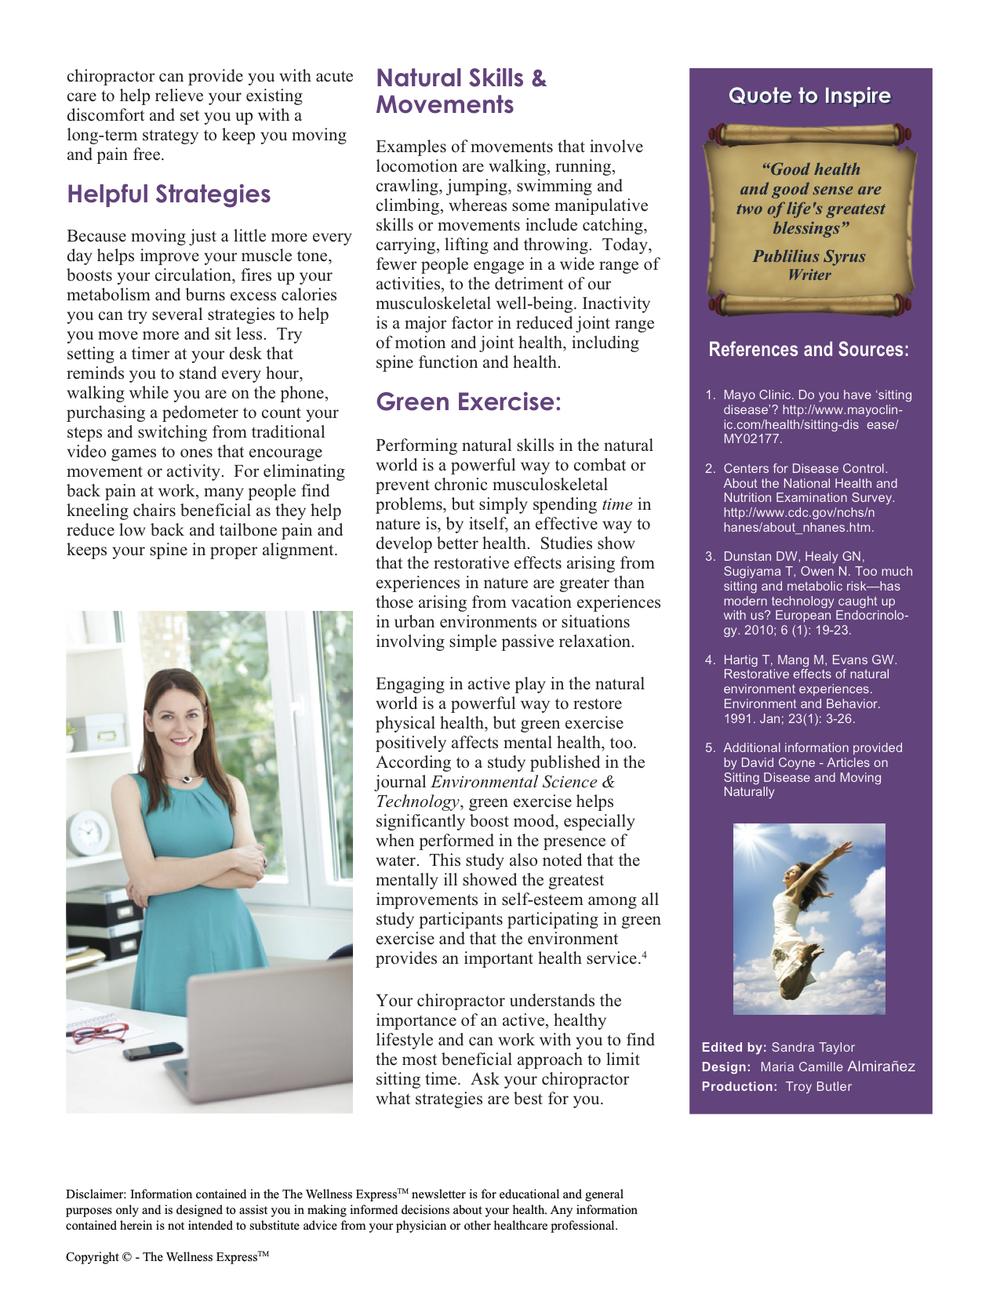 Weekly Newsletter: Sitting Disease vs. Movement